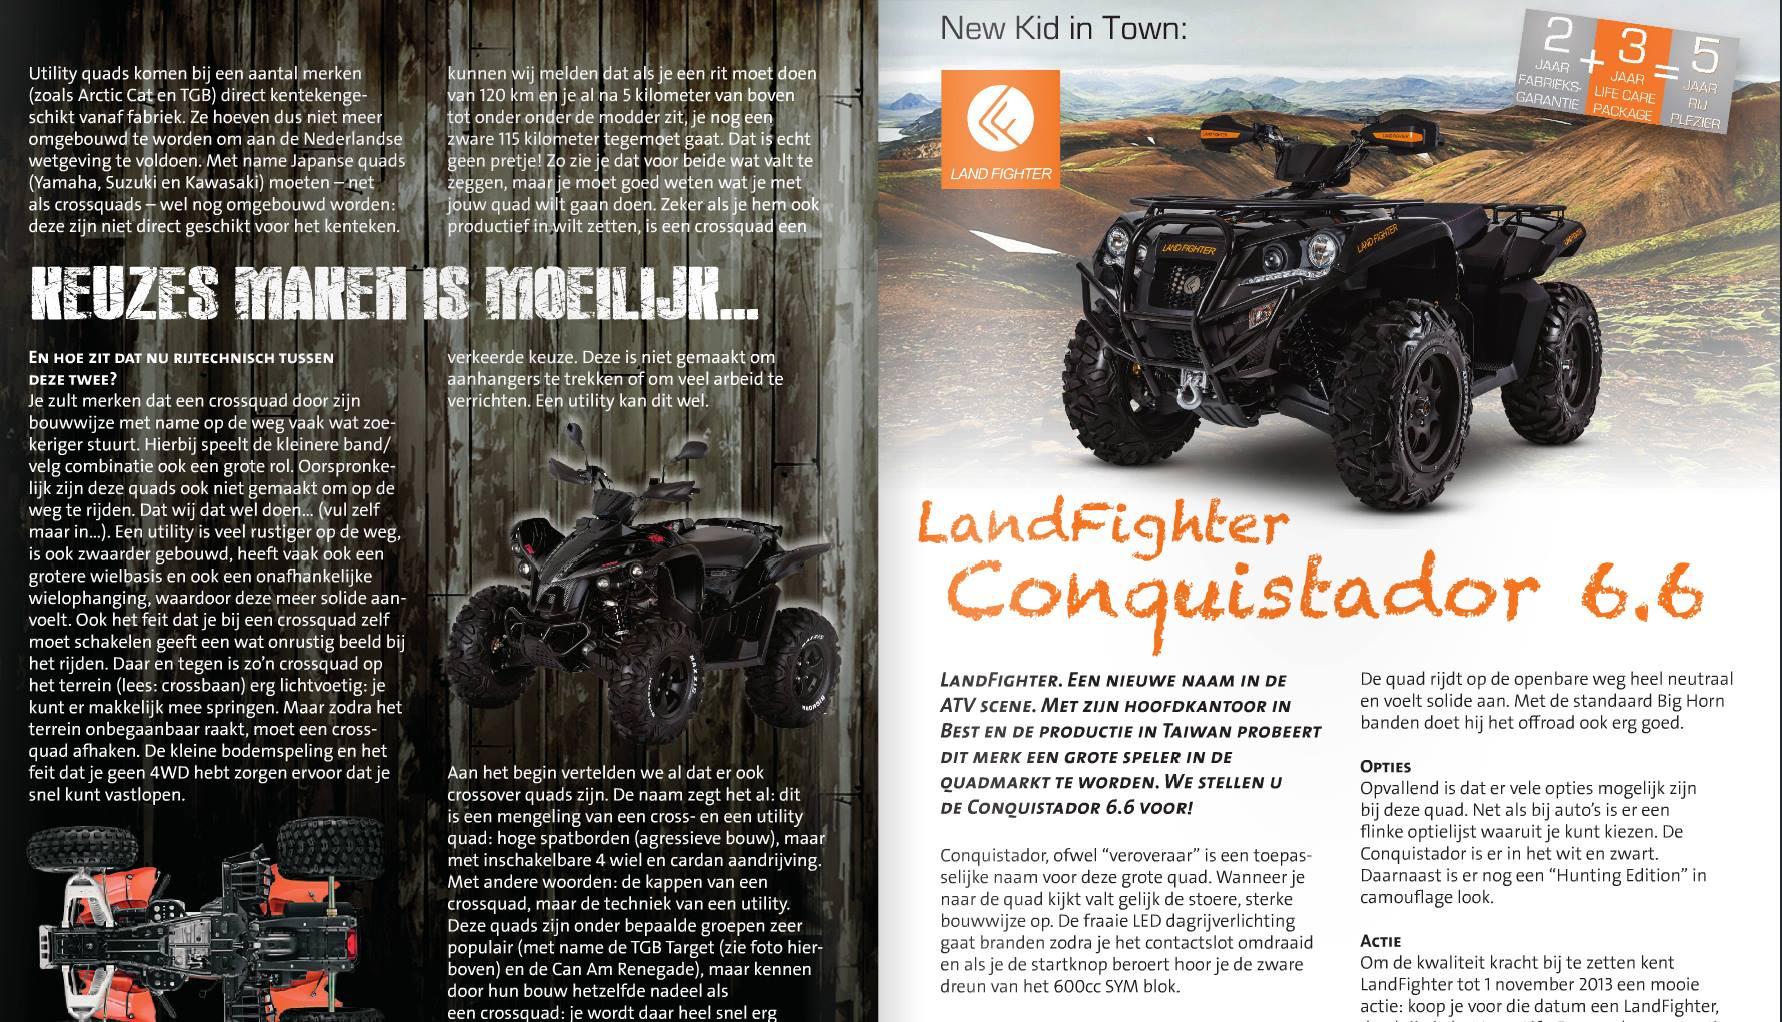 LandFighter_Demolition_5.5_SuperSport_NERO_Conquistador_6.6_quads_quad_atv_utv_ssv_side_by_side_utility_coches_moto_motos_cuatrimoto_cuadrimoto_quadwise_magazine_article_artikel_01